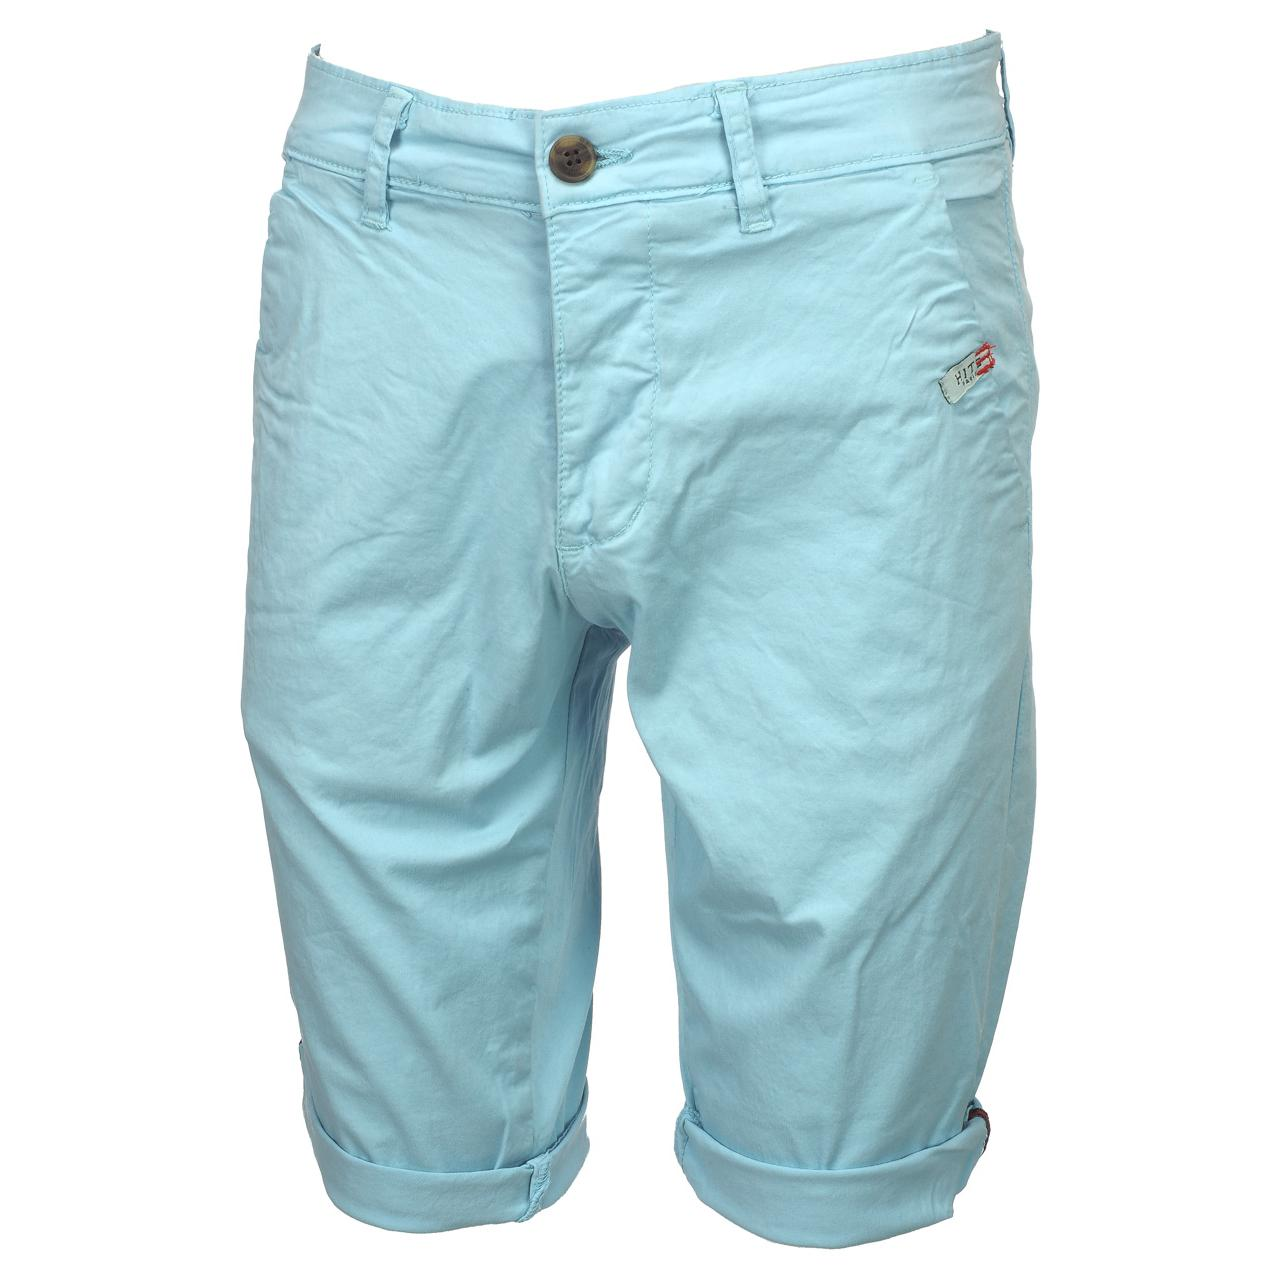 Bermuda-Shorts-Hite-Couture-Vobier-Sky-Bermuda-Chino-Blue-11597-New